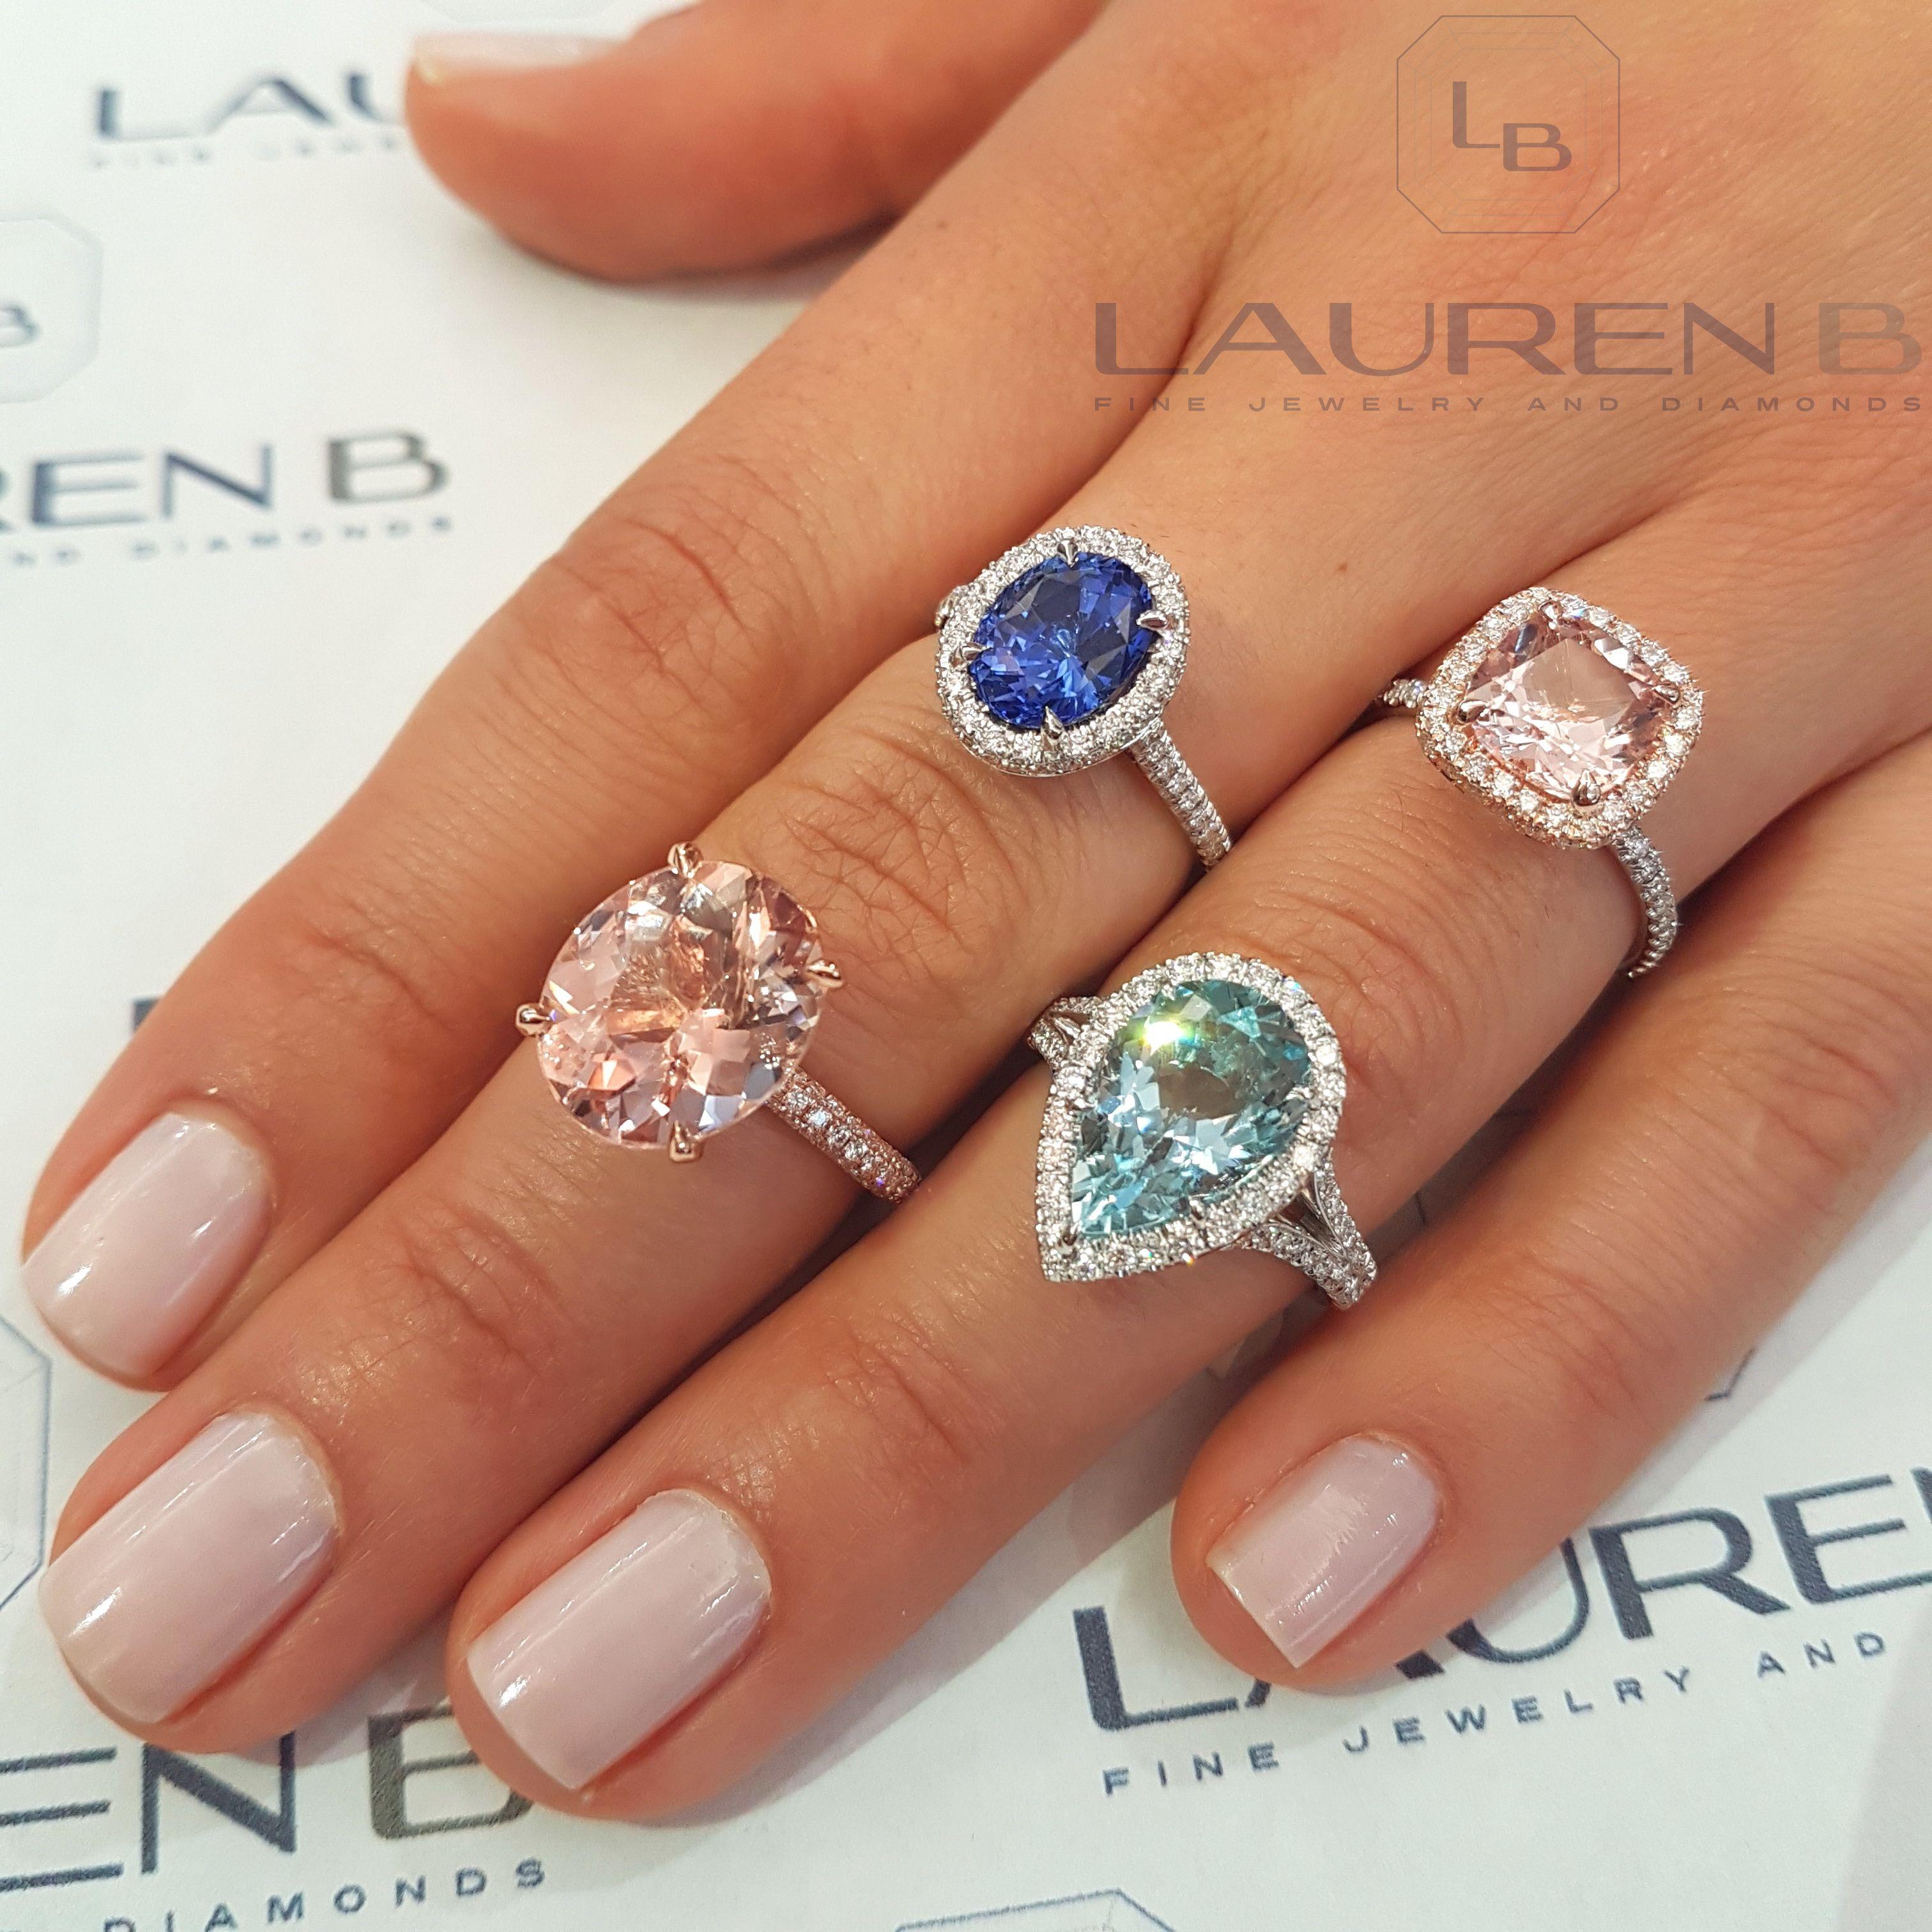 Vibrant semiprecious gemstone and diamond creations from